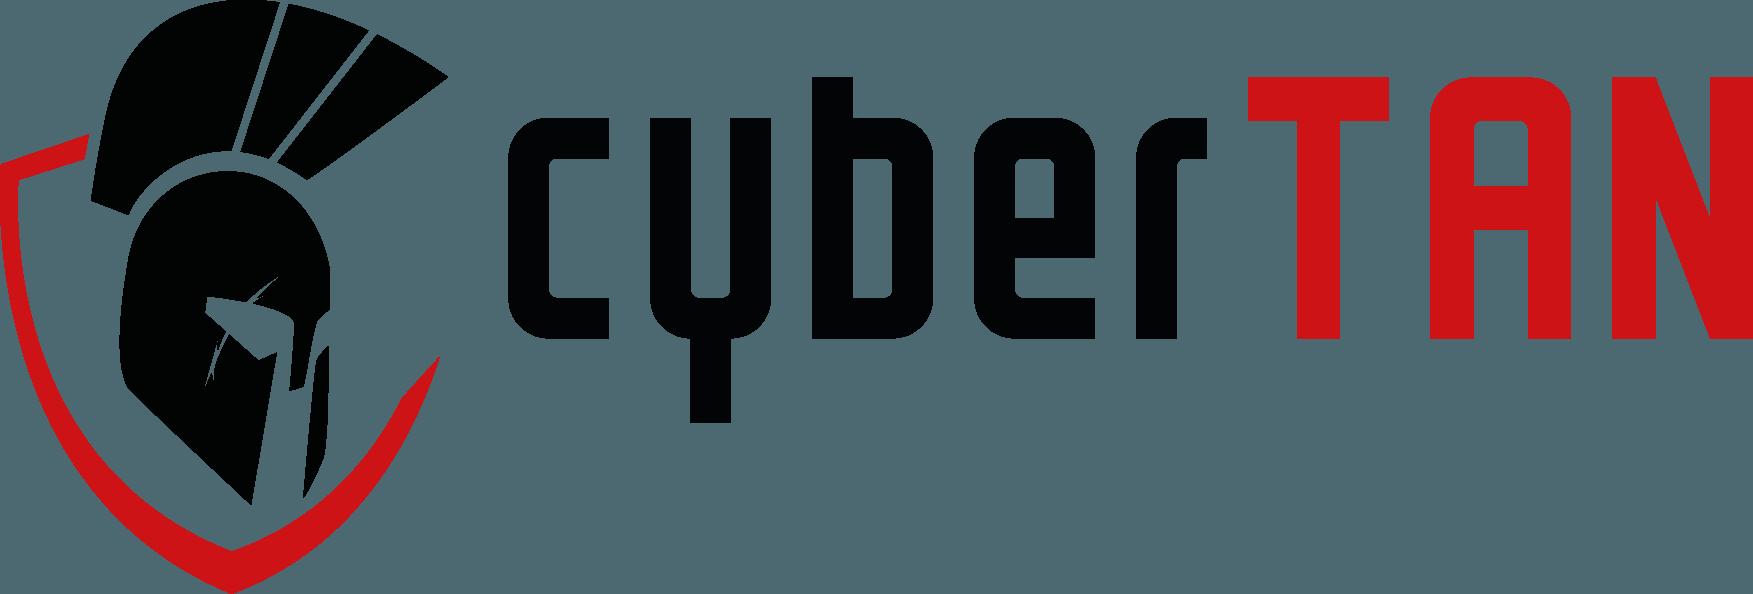 CyberTAN logo